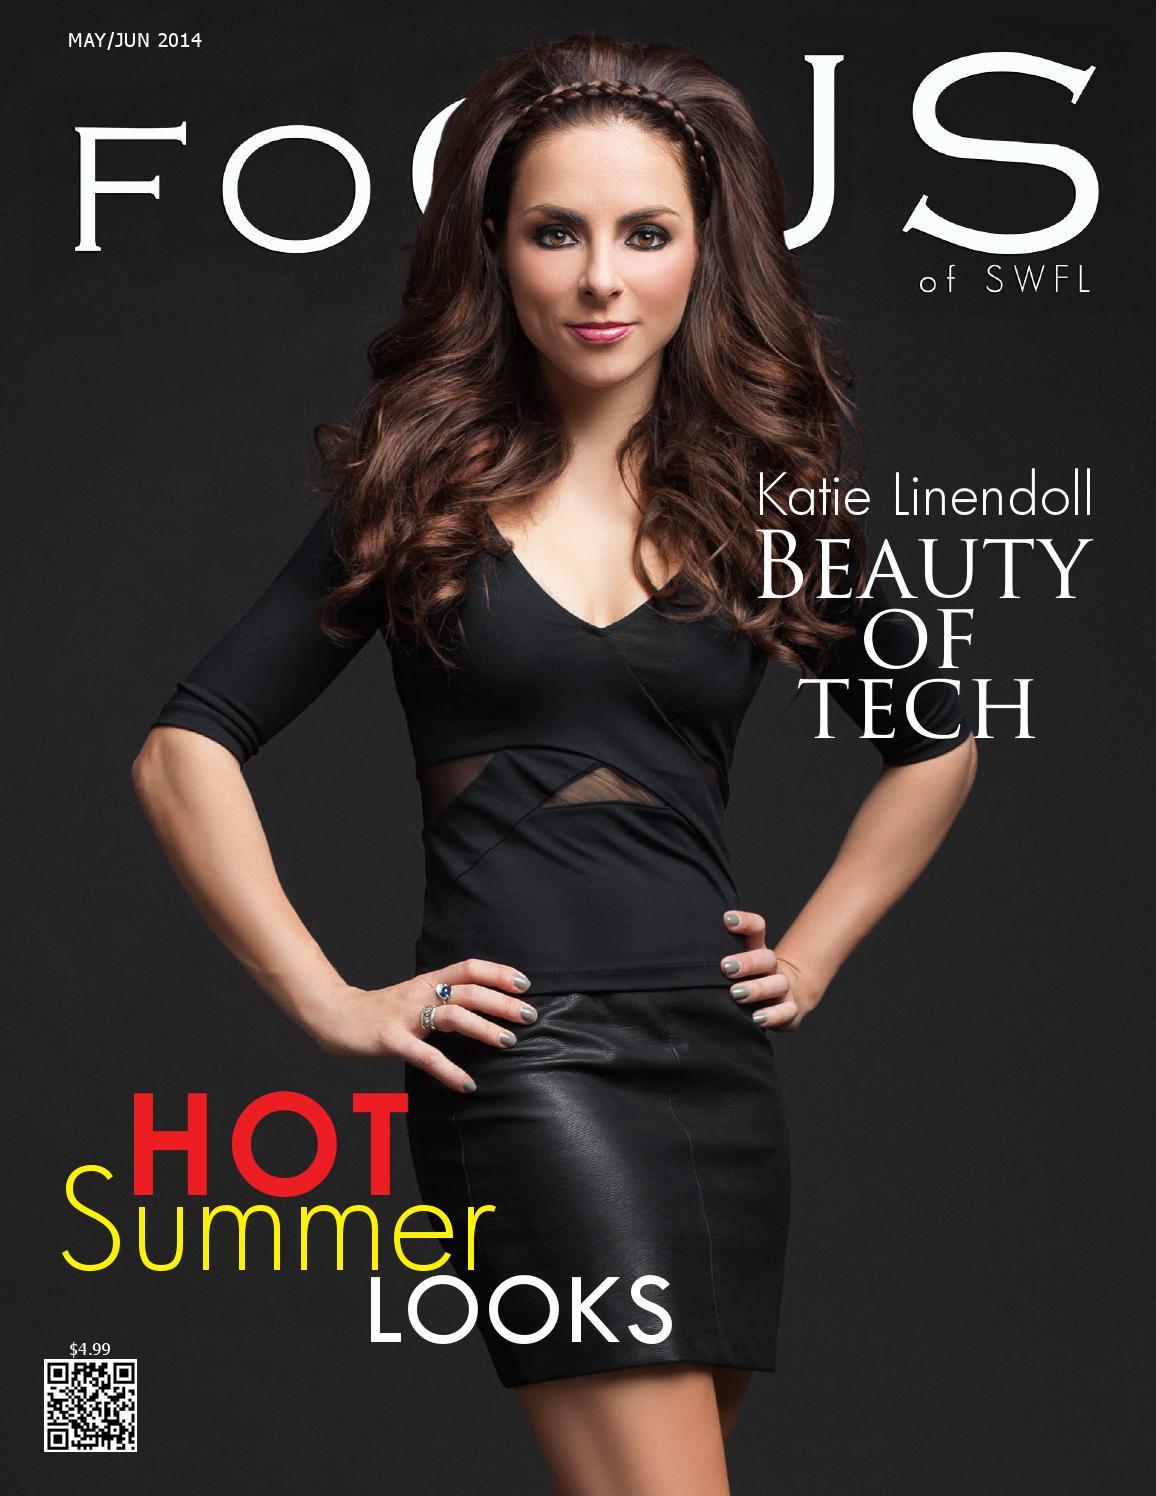 e3b4e7e914a Focus Magazine Hot Summer Looks by Focus Magazine of SWFL - issuu